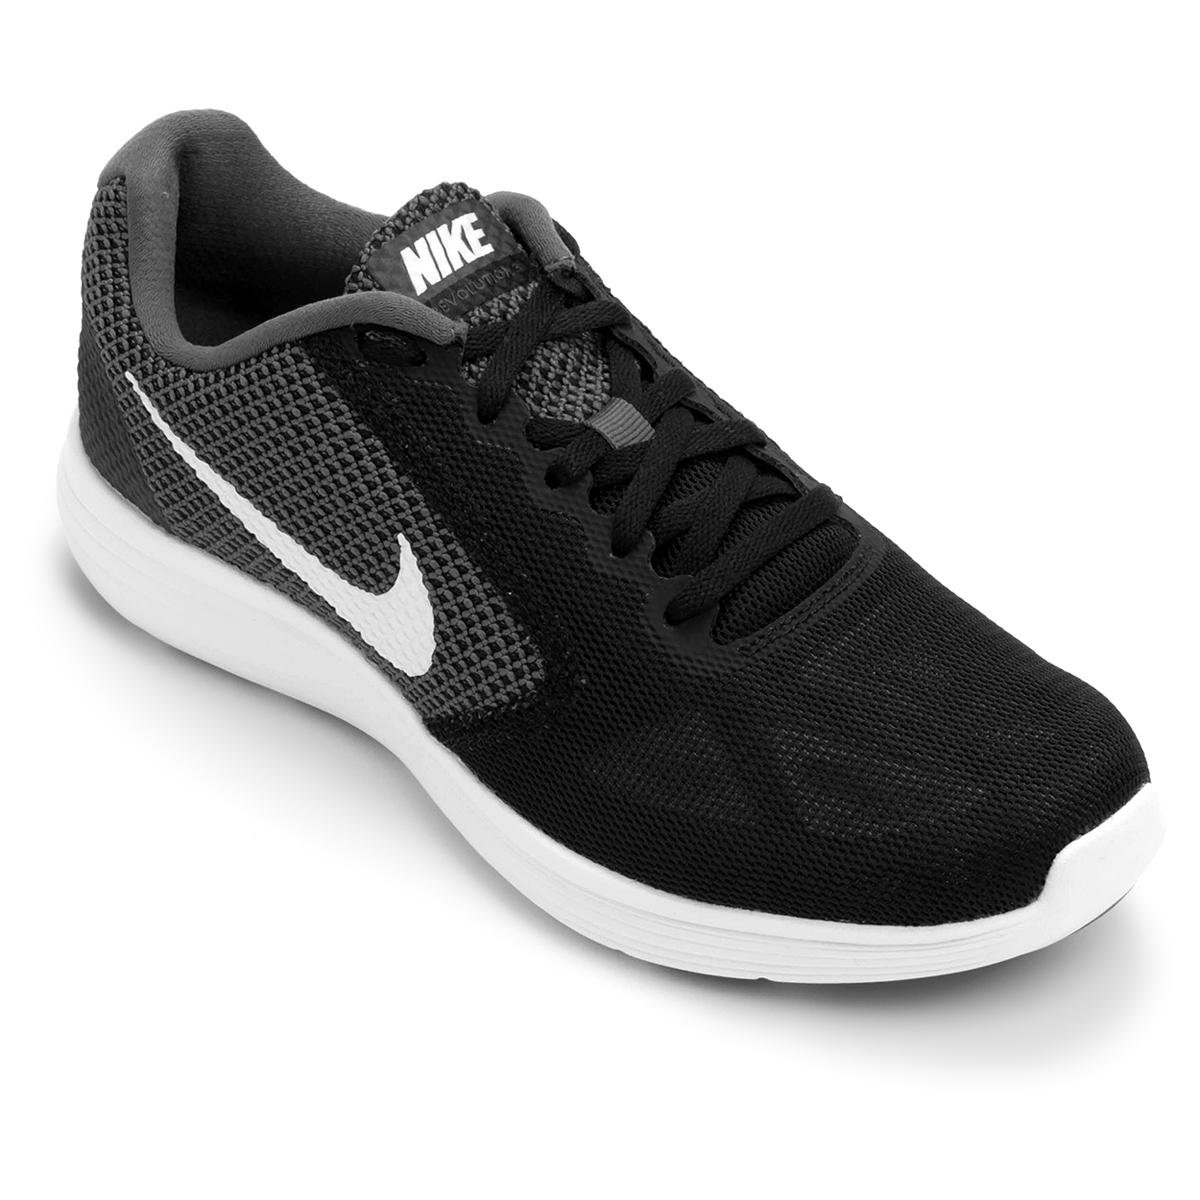 5b6df5d8fd Tênis Nike Revolution 3 Masculino - Preto e Cinza - Compre Agora ...